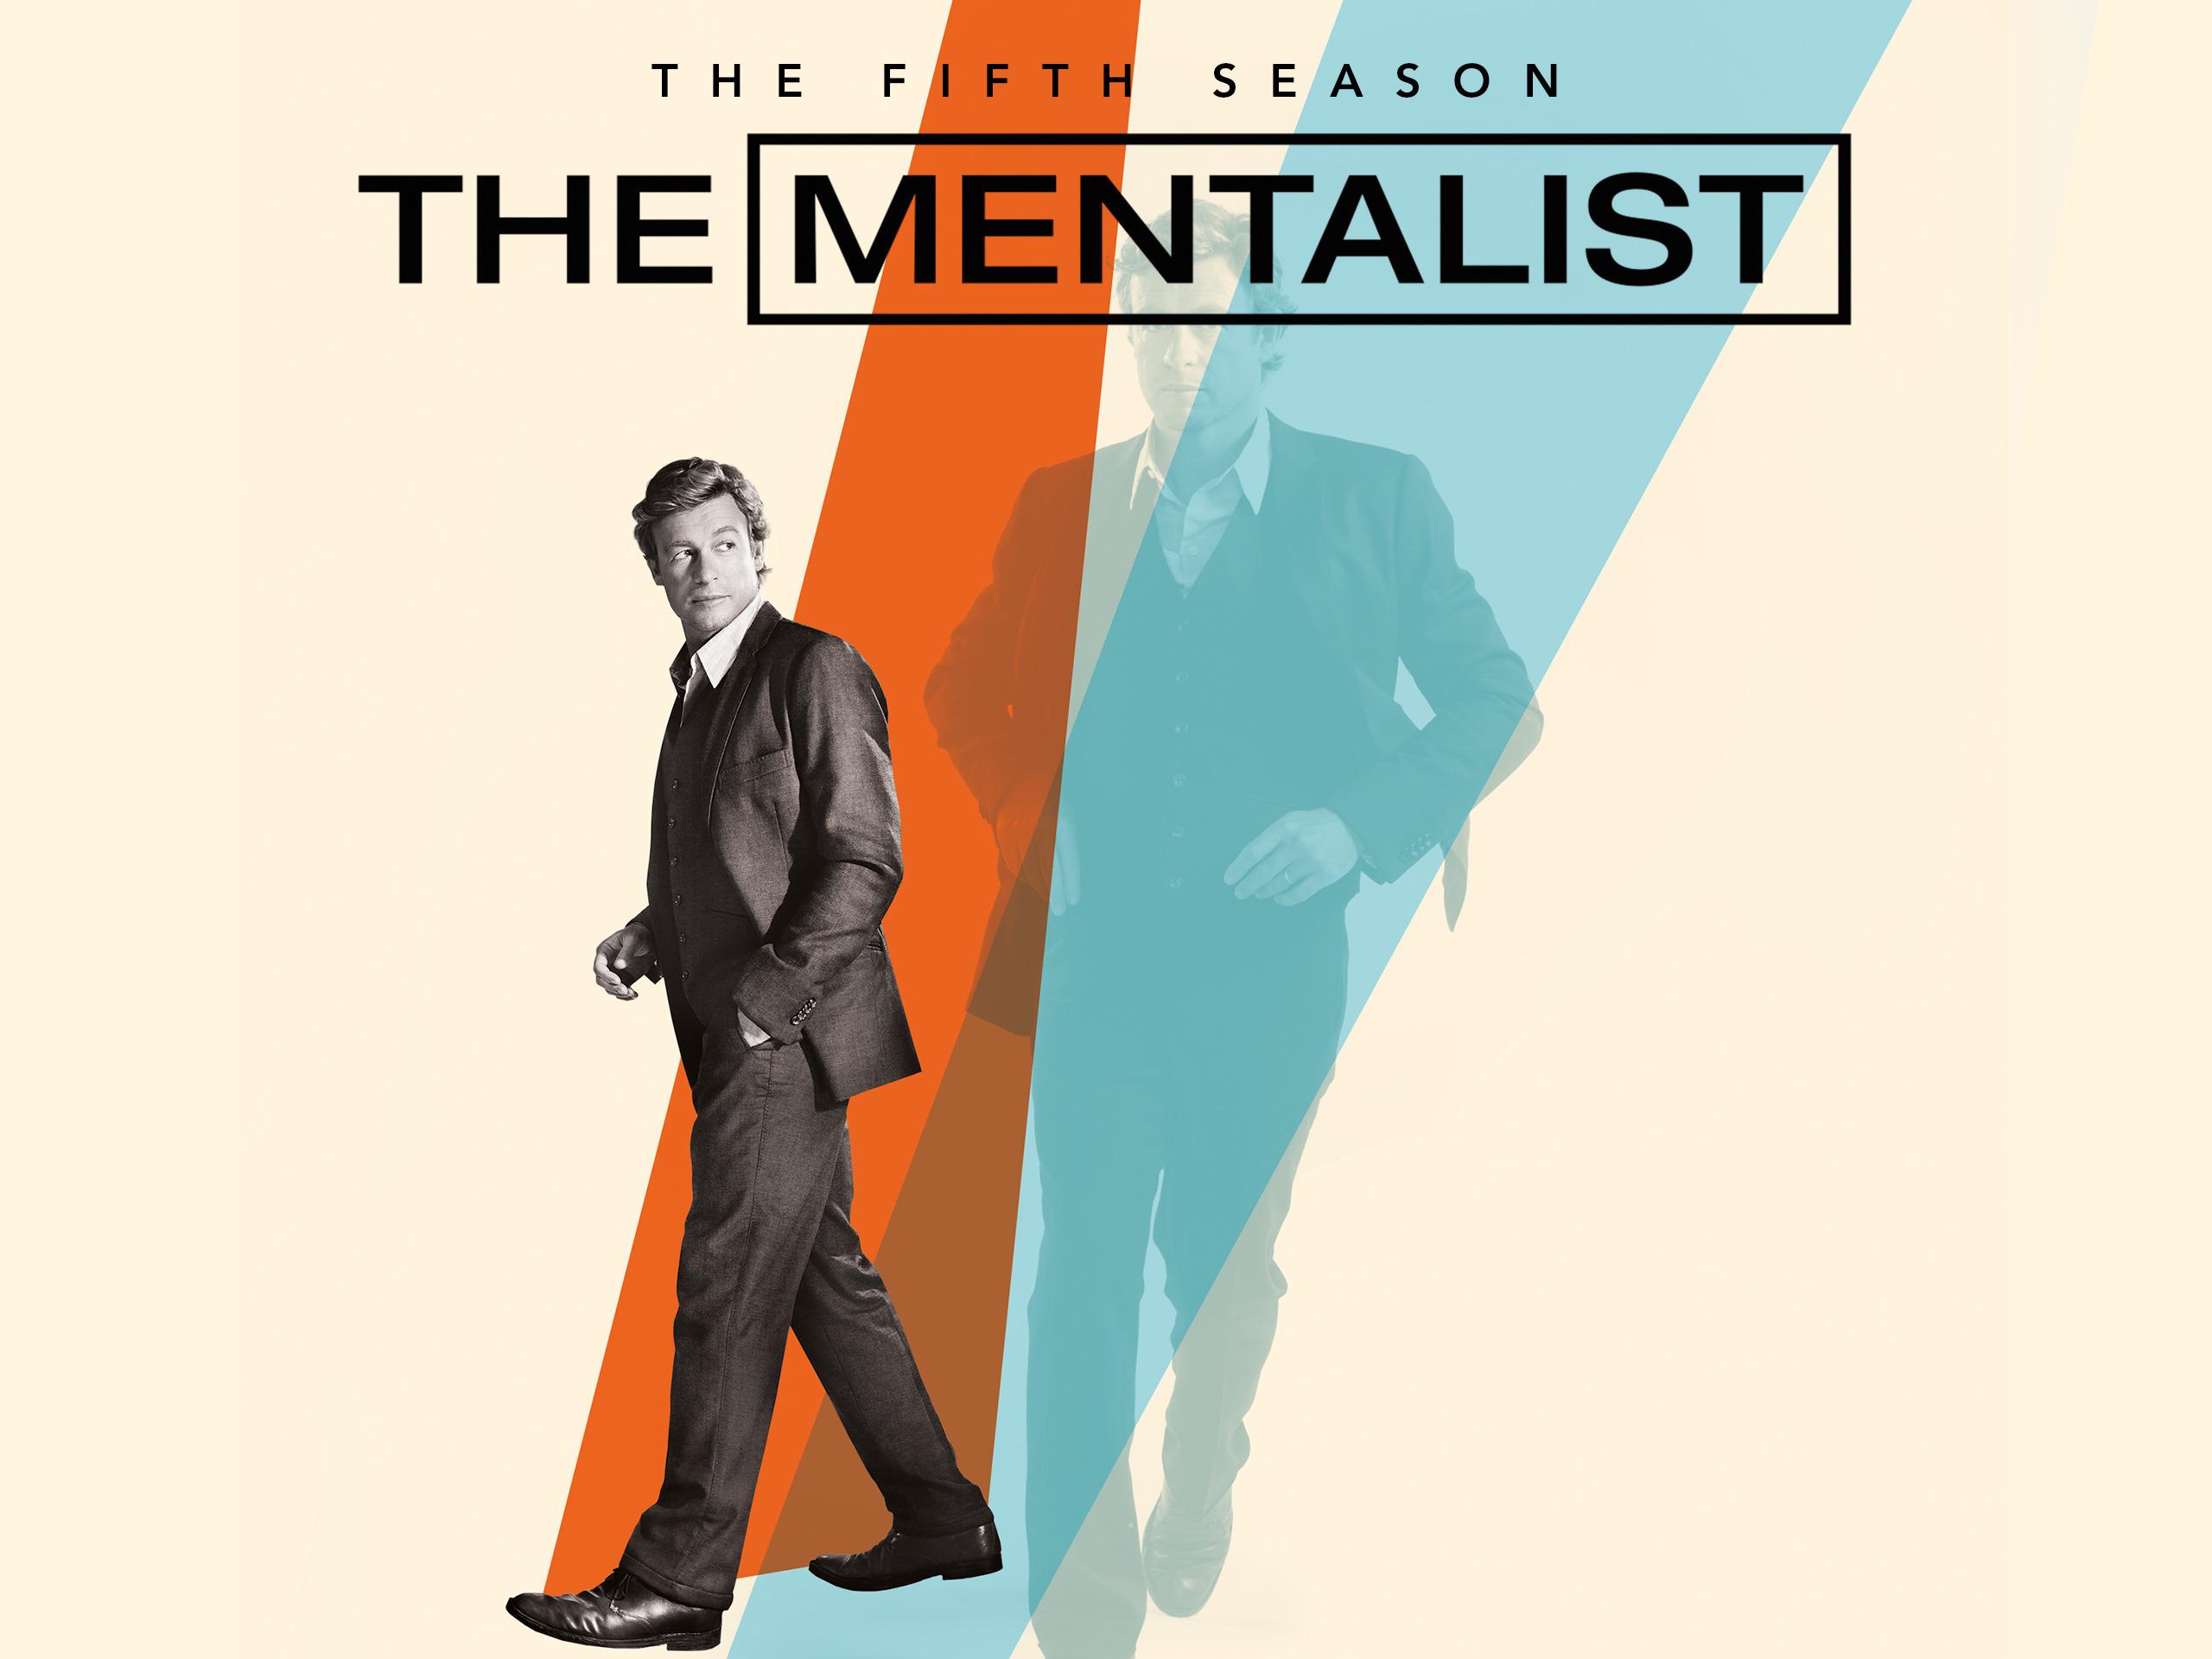 Prime Video: The Mentalist: The Complete Fifth Season